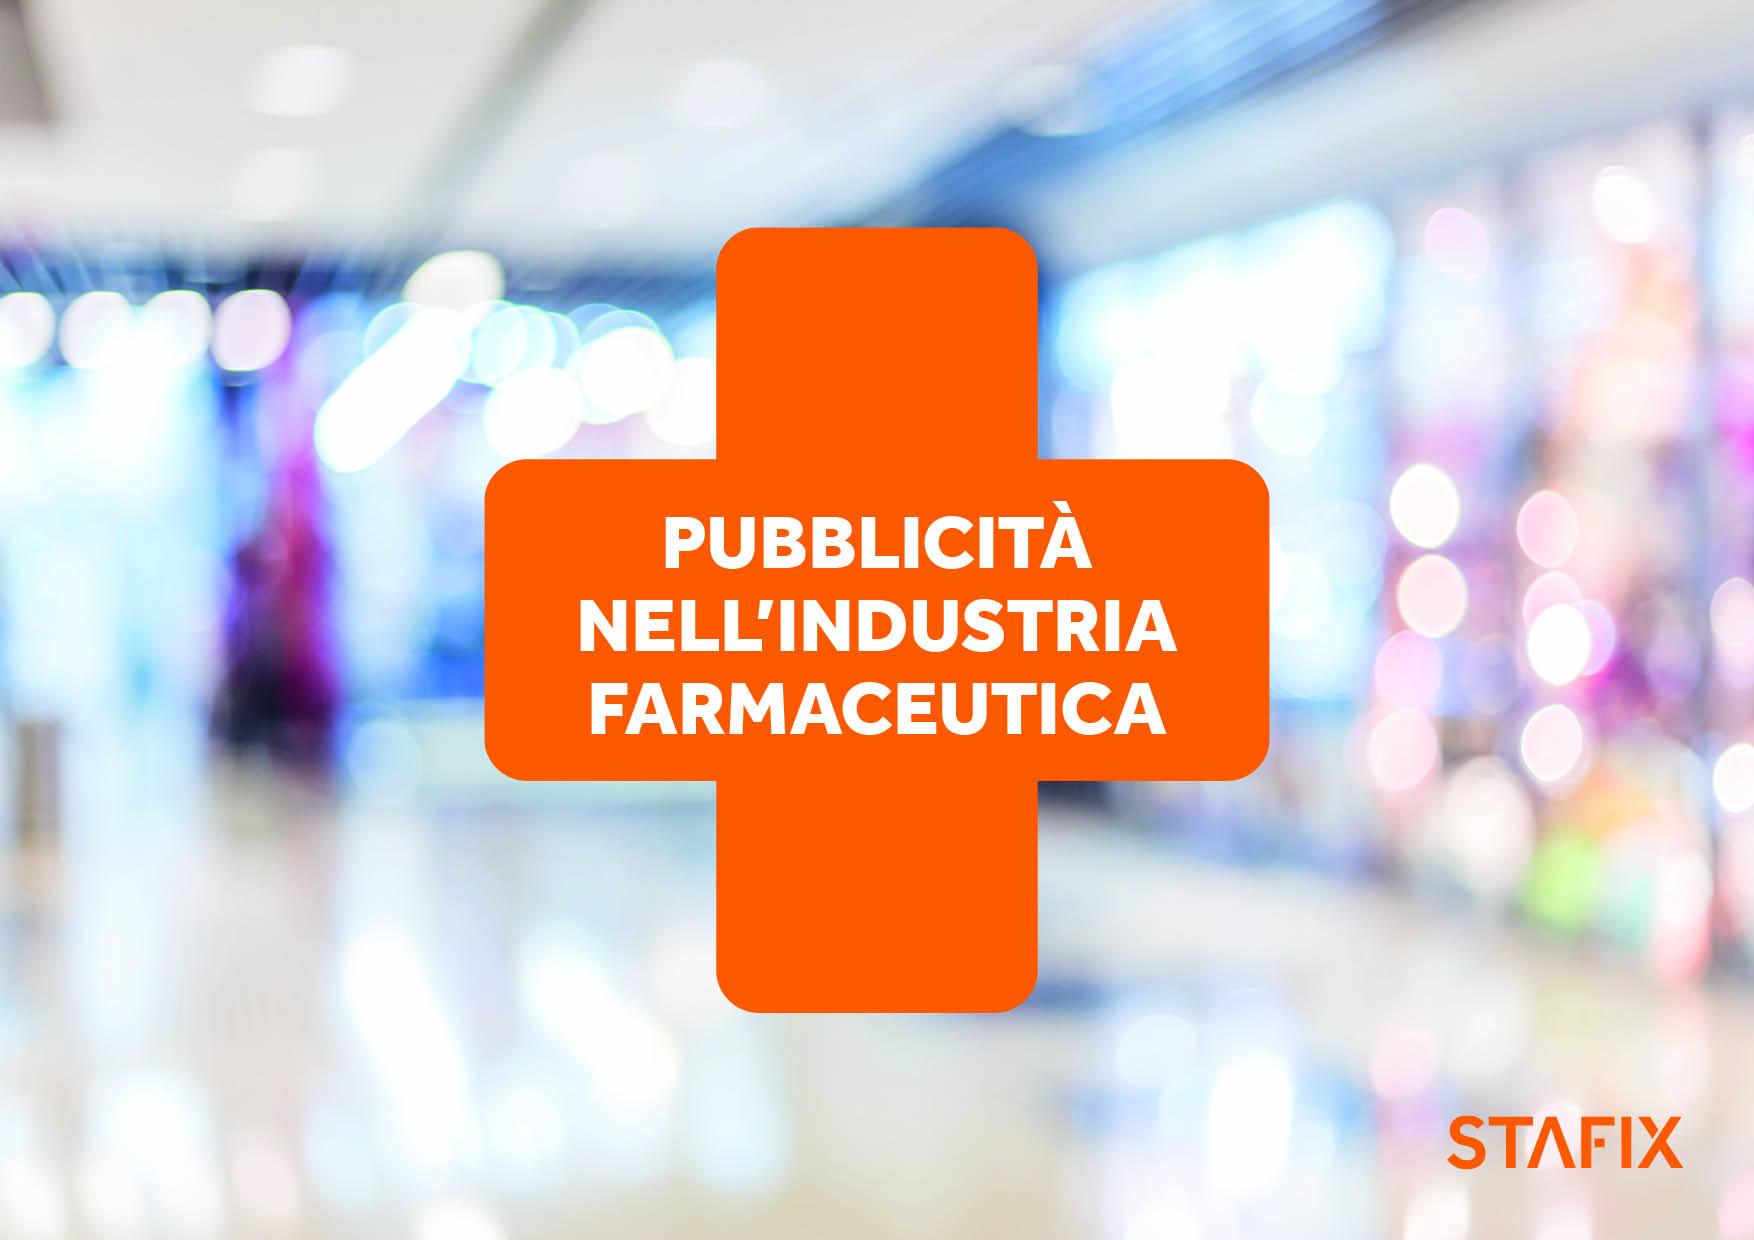 STAFIX_eBOOK_Pharma_2_2018_ITA_web.jpg